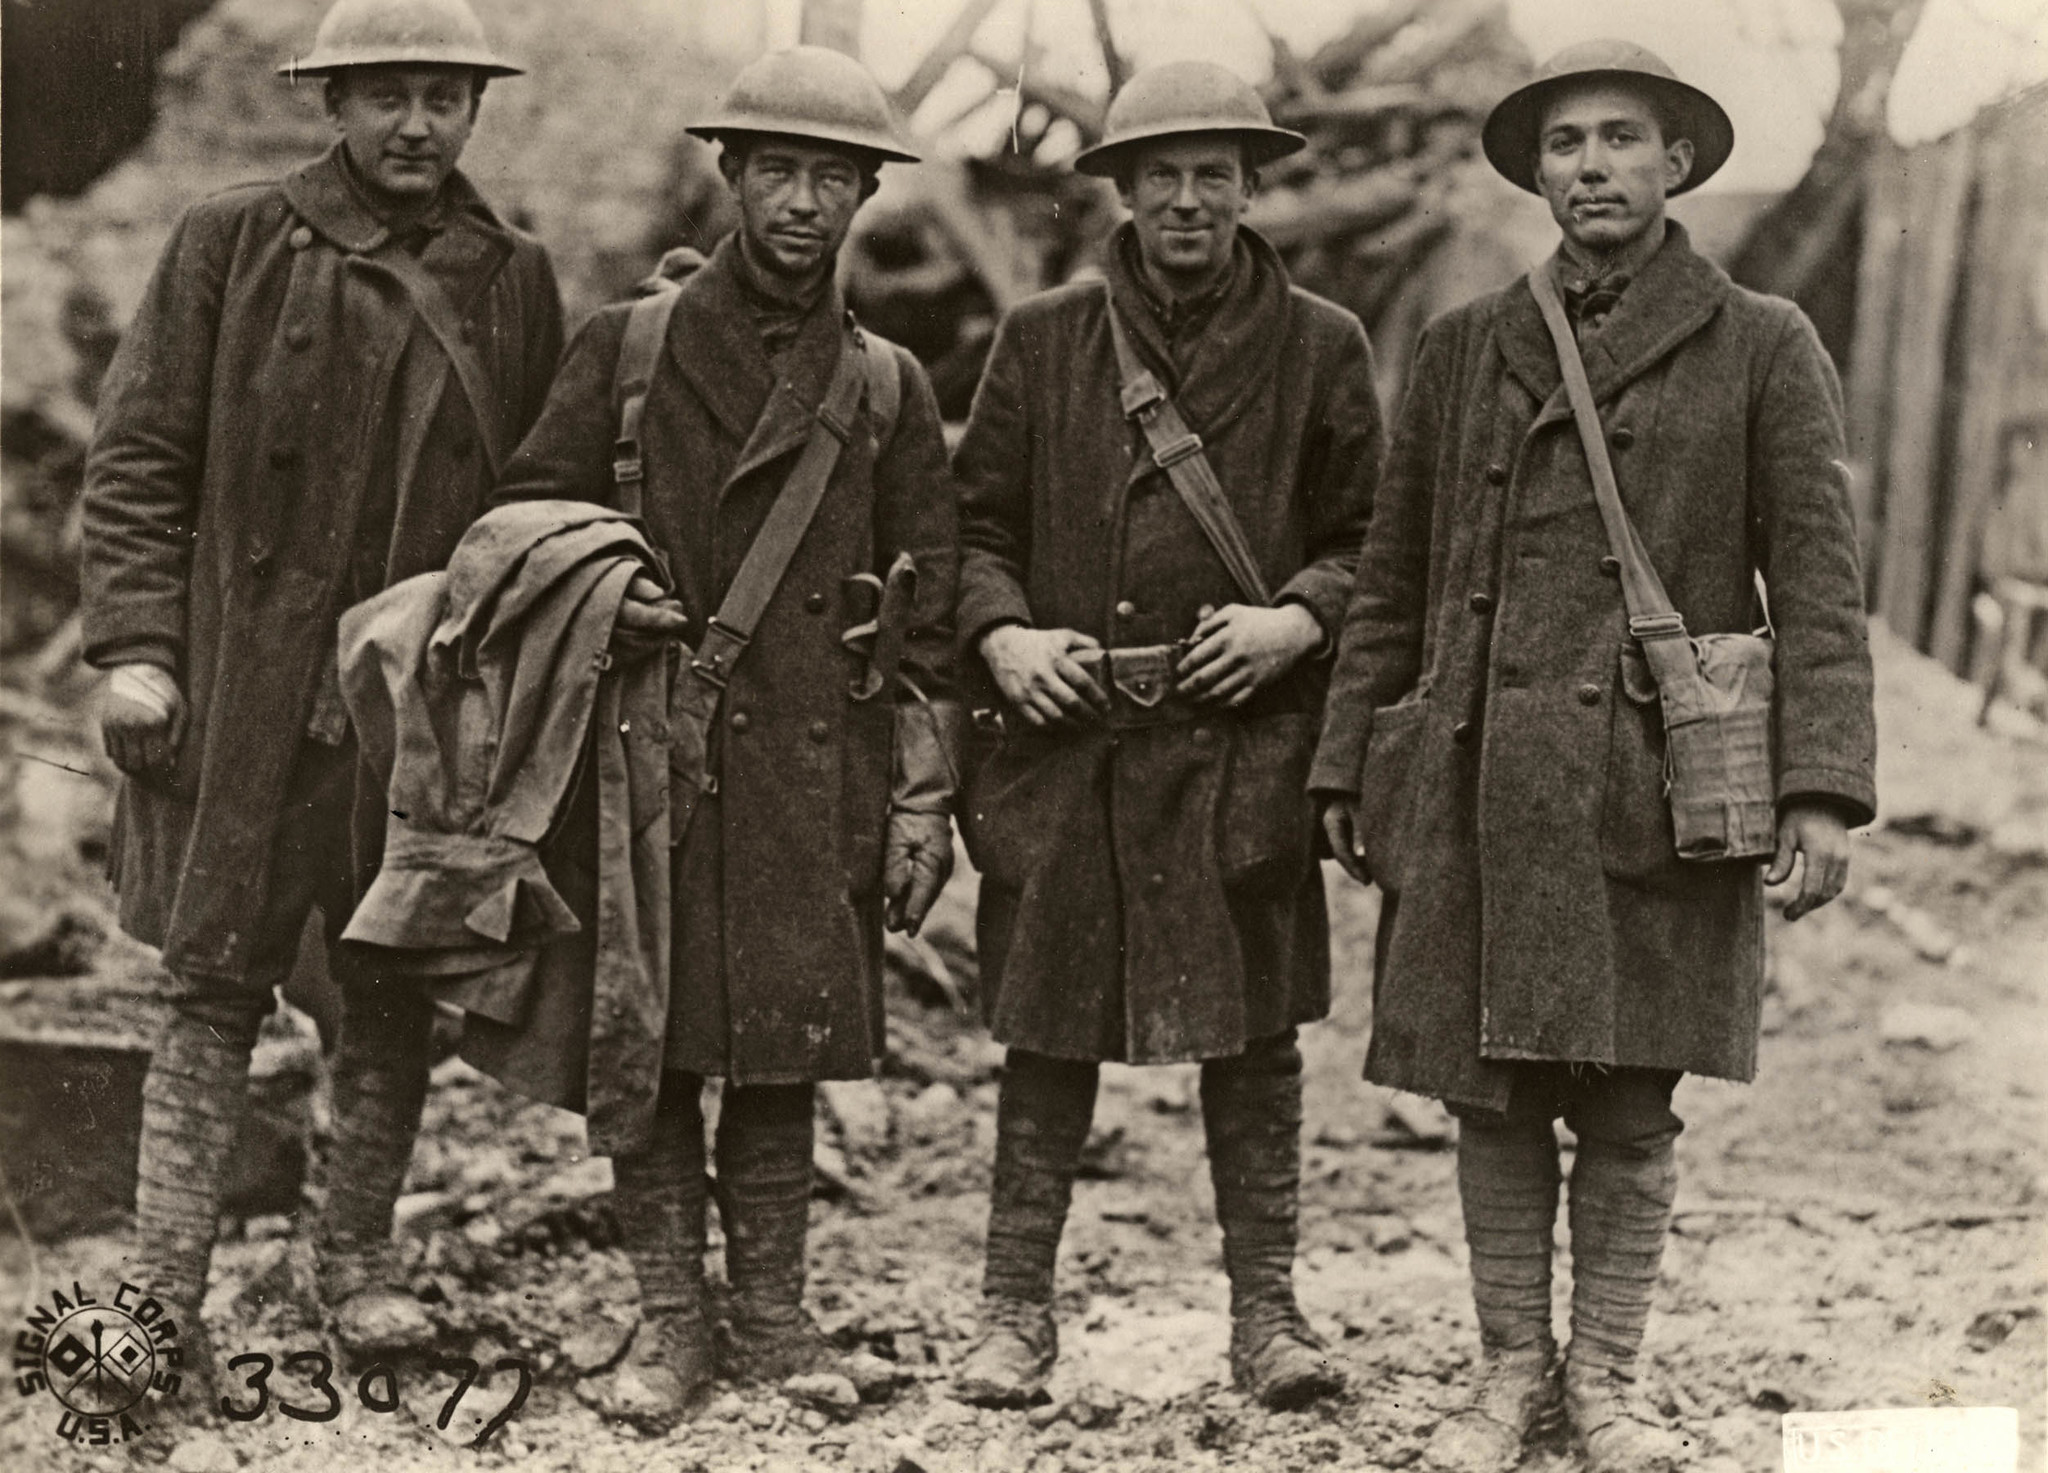 Nov. 11, 1918